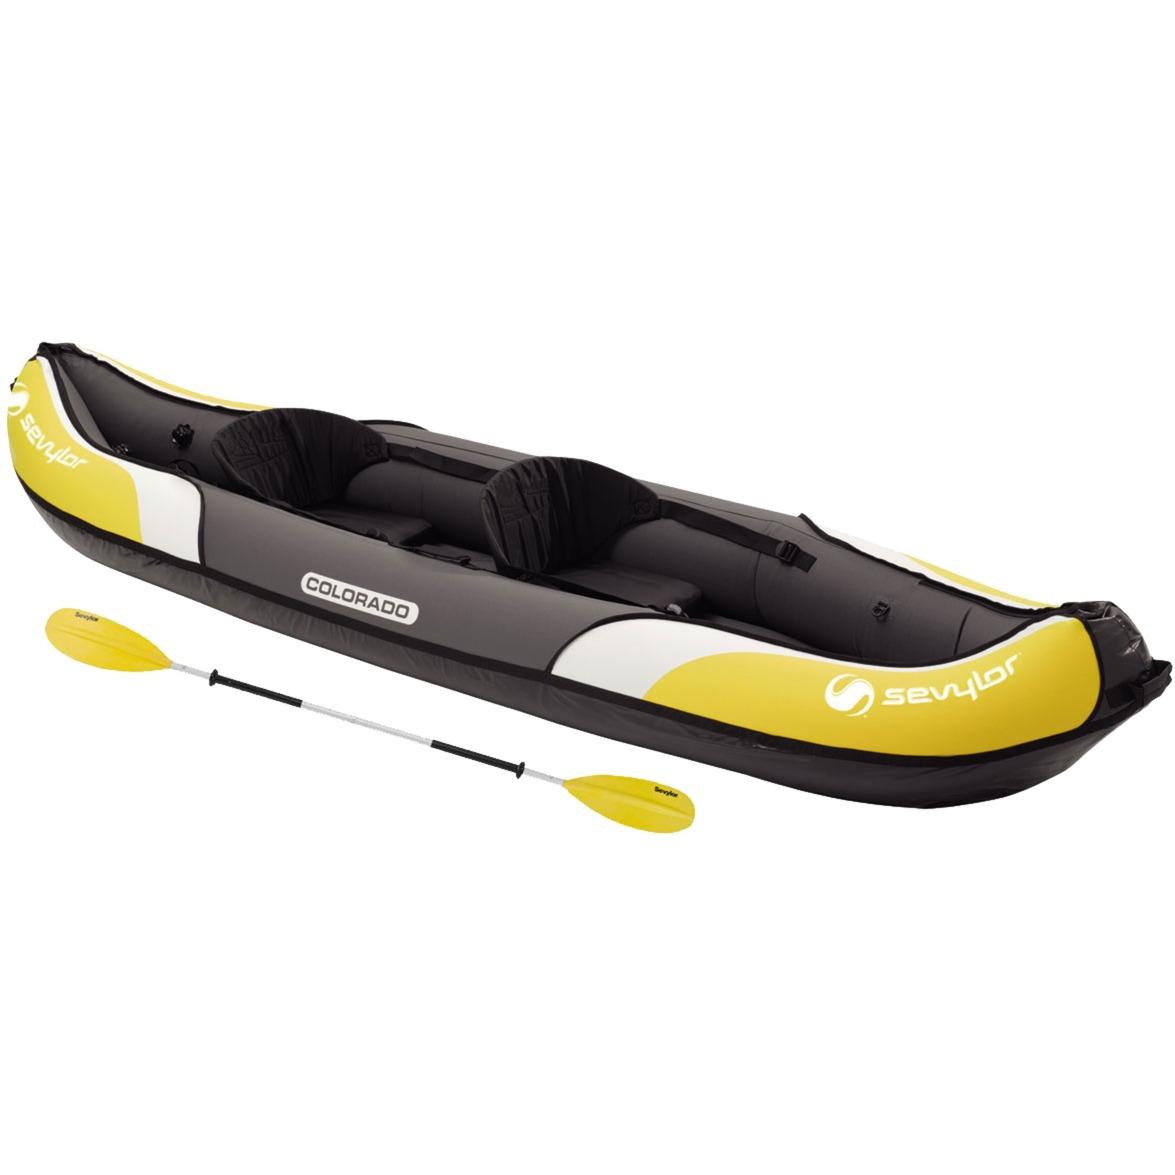 2000016743 2personas(s) Negro, Color blanco, Amarillo kayak deportivo, Barco inflable